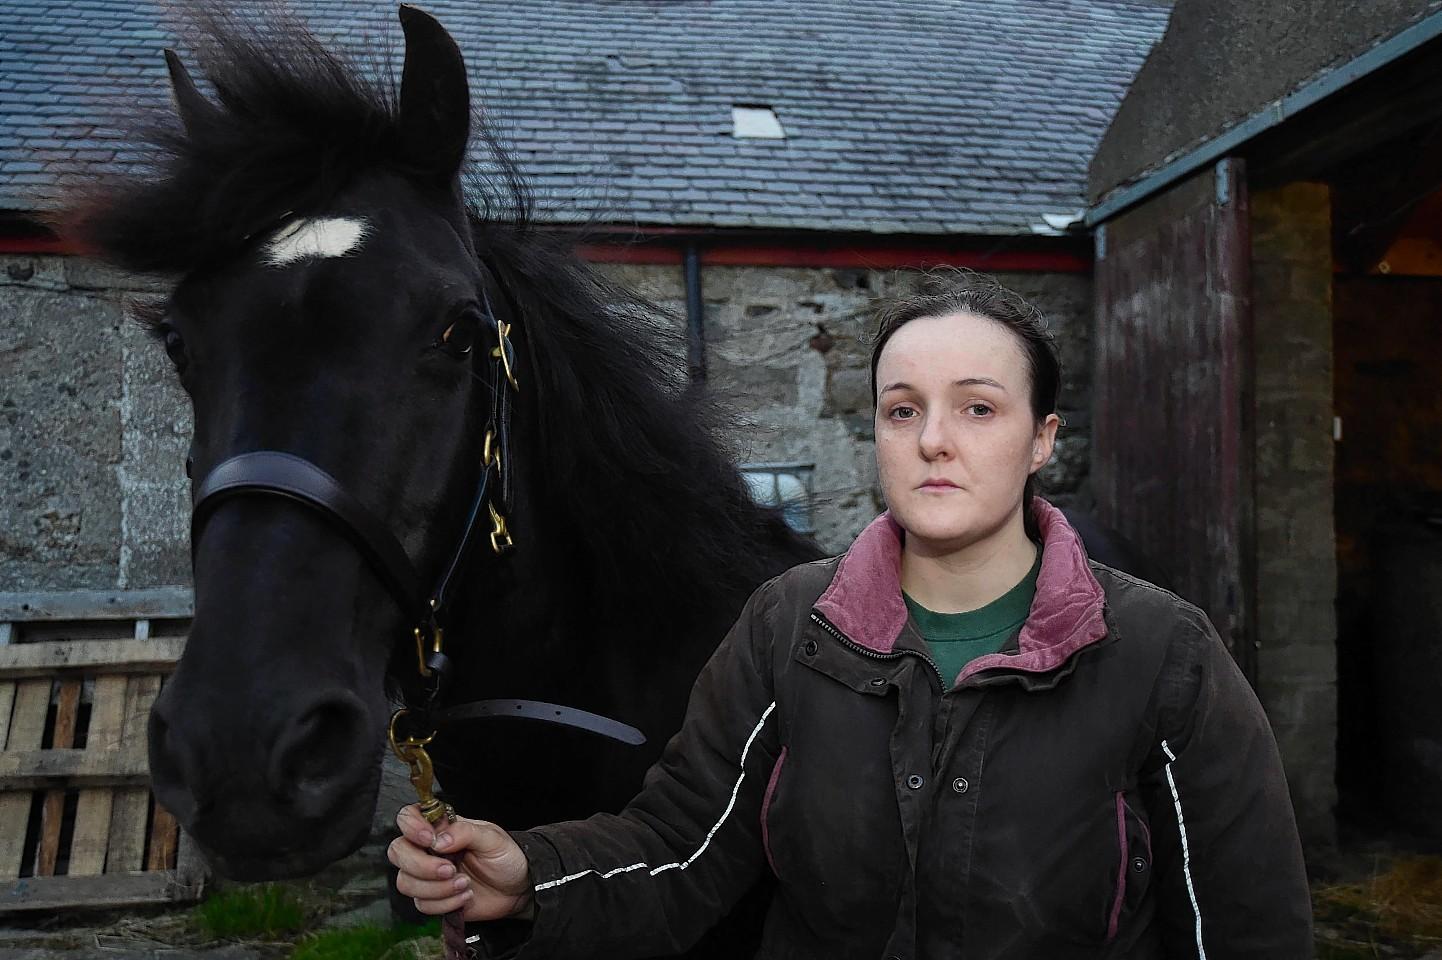 Zoe owns six horses